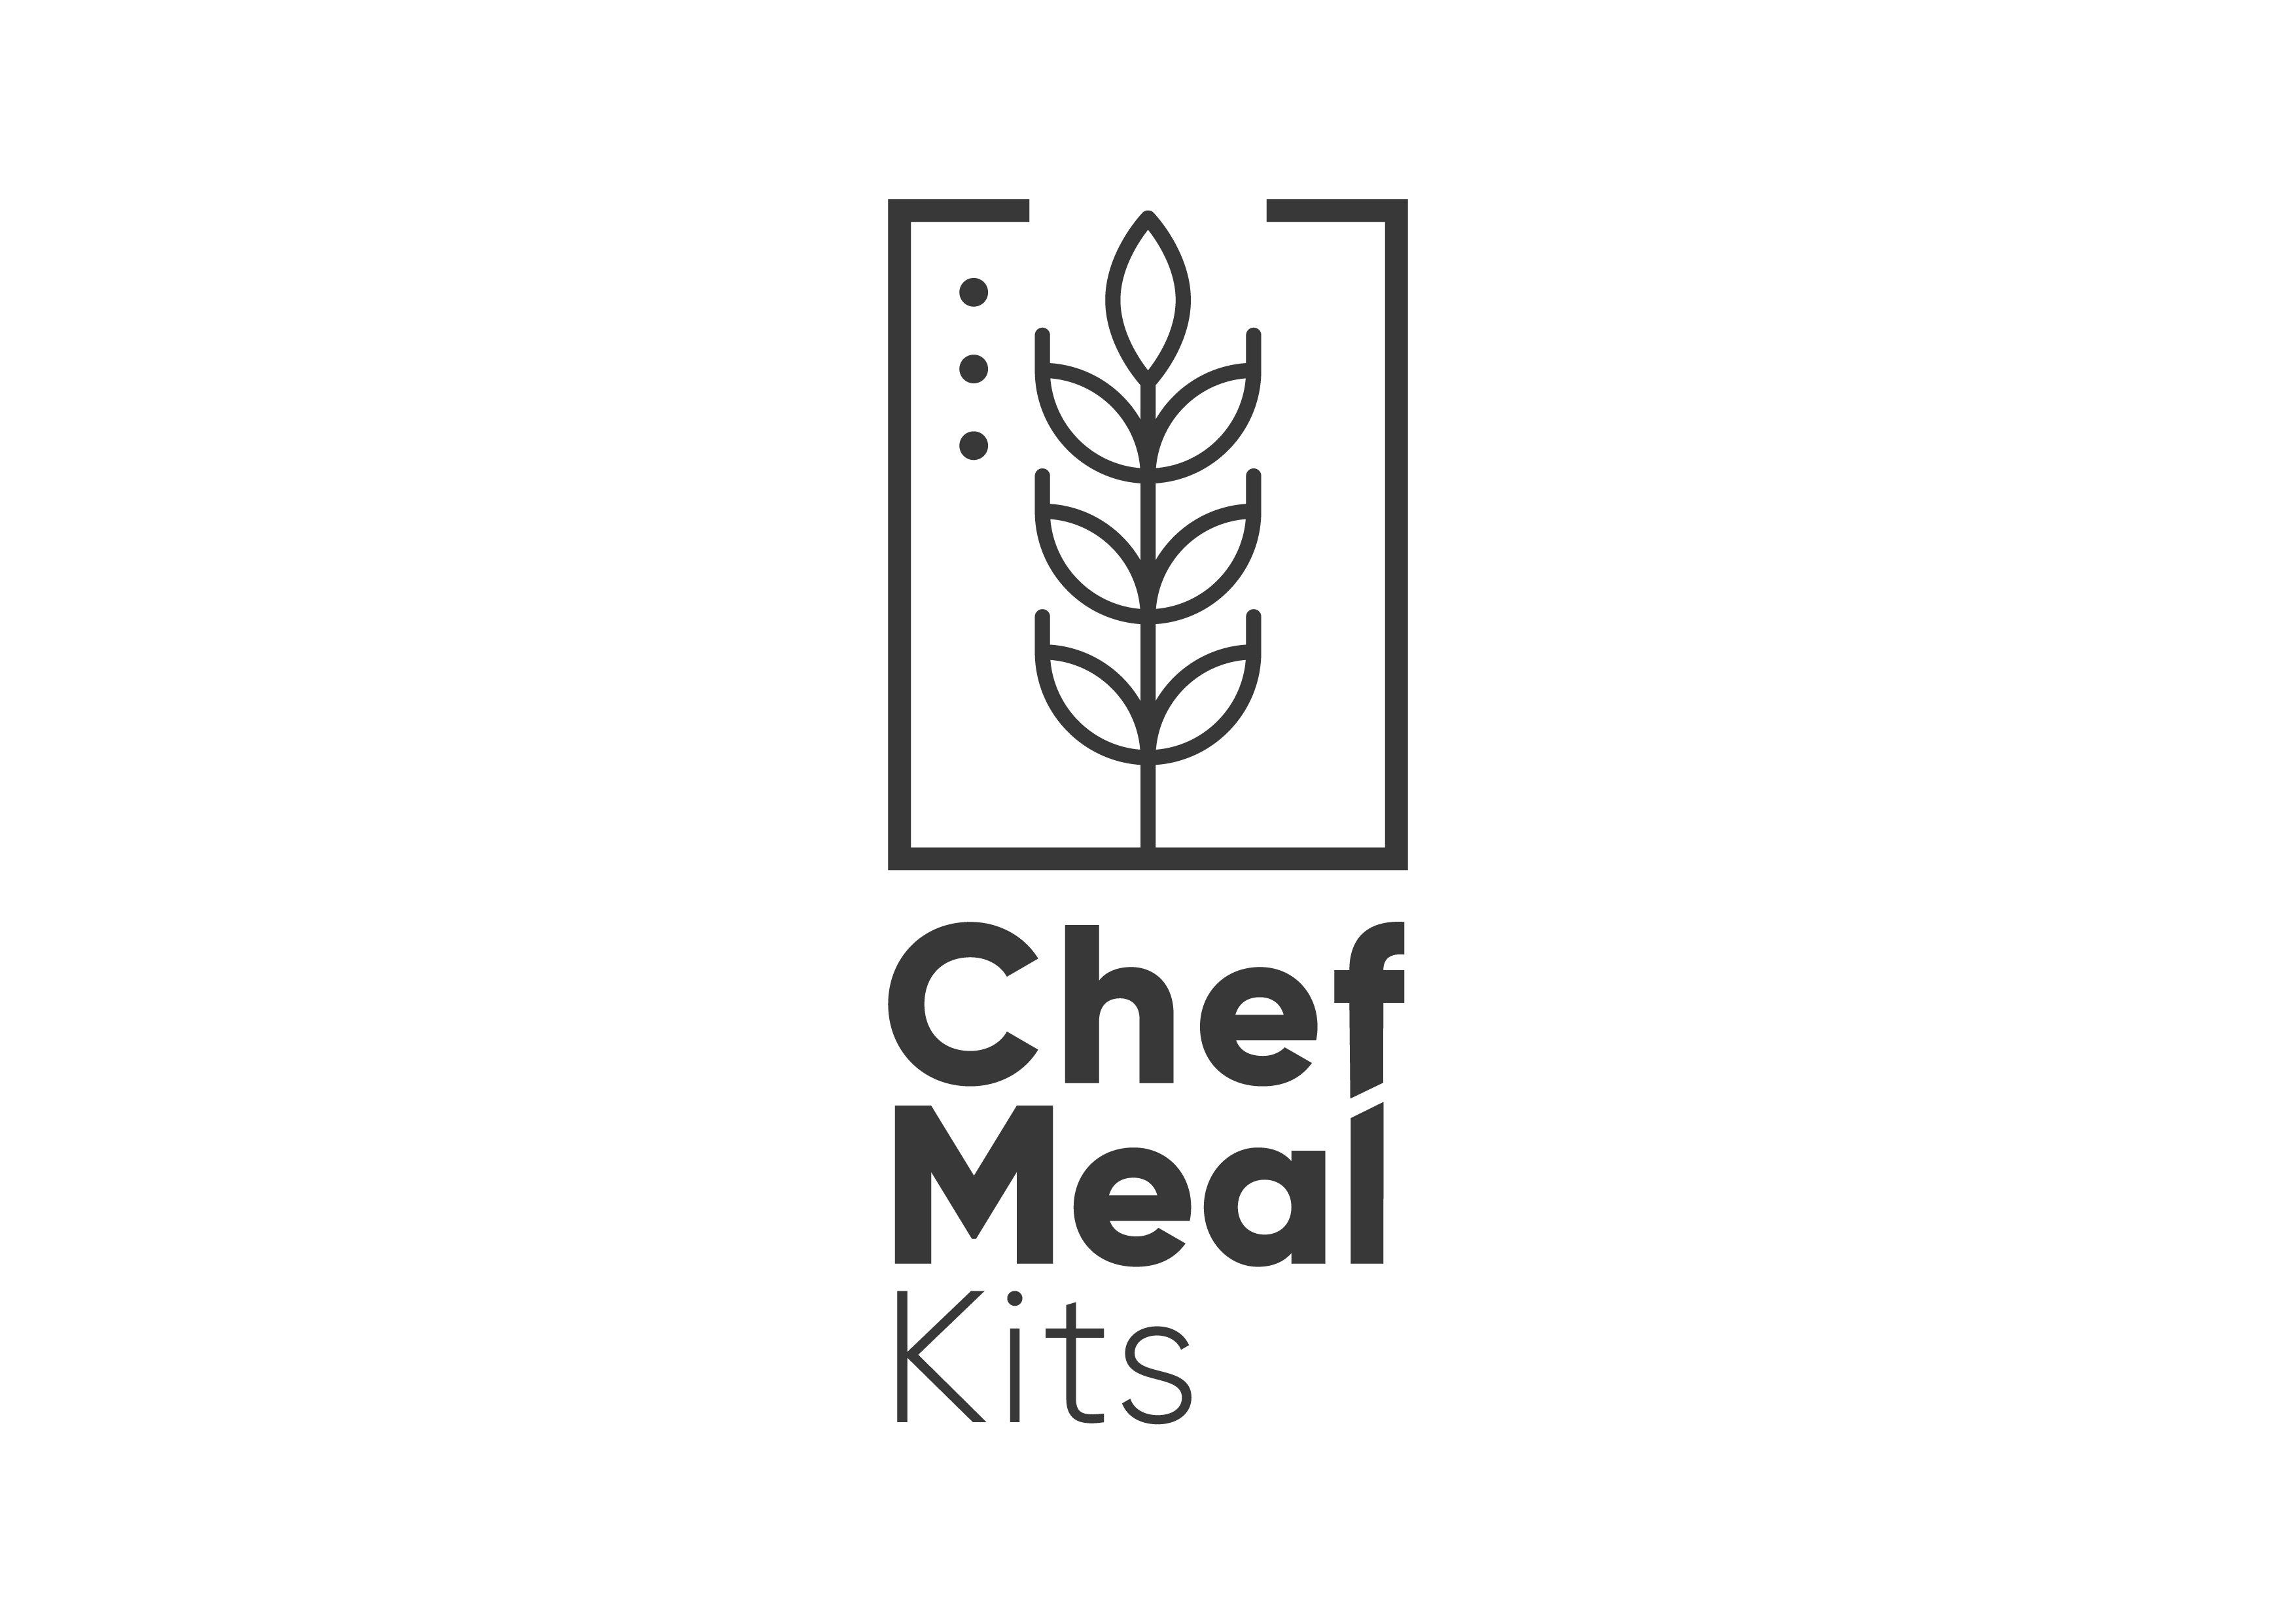 Chef Meal Kits